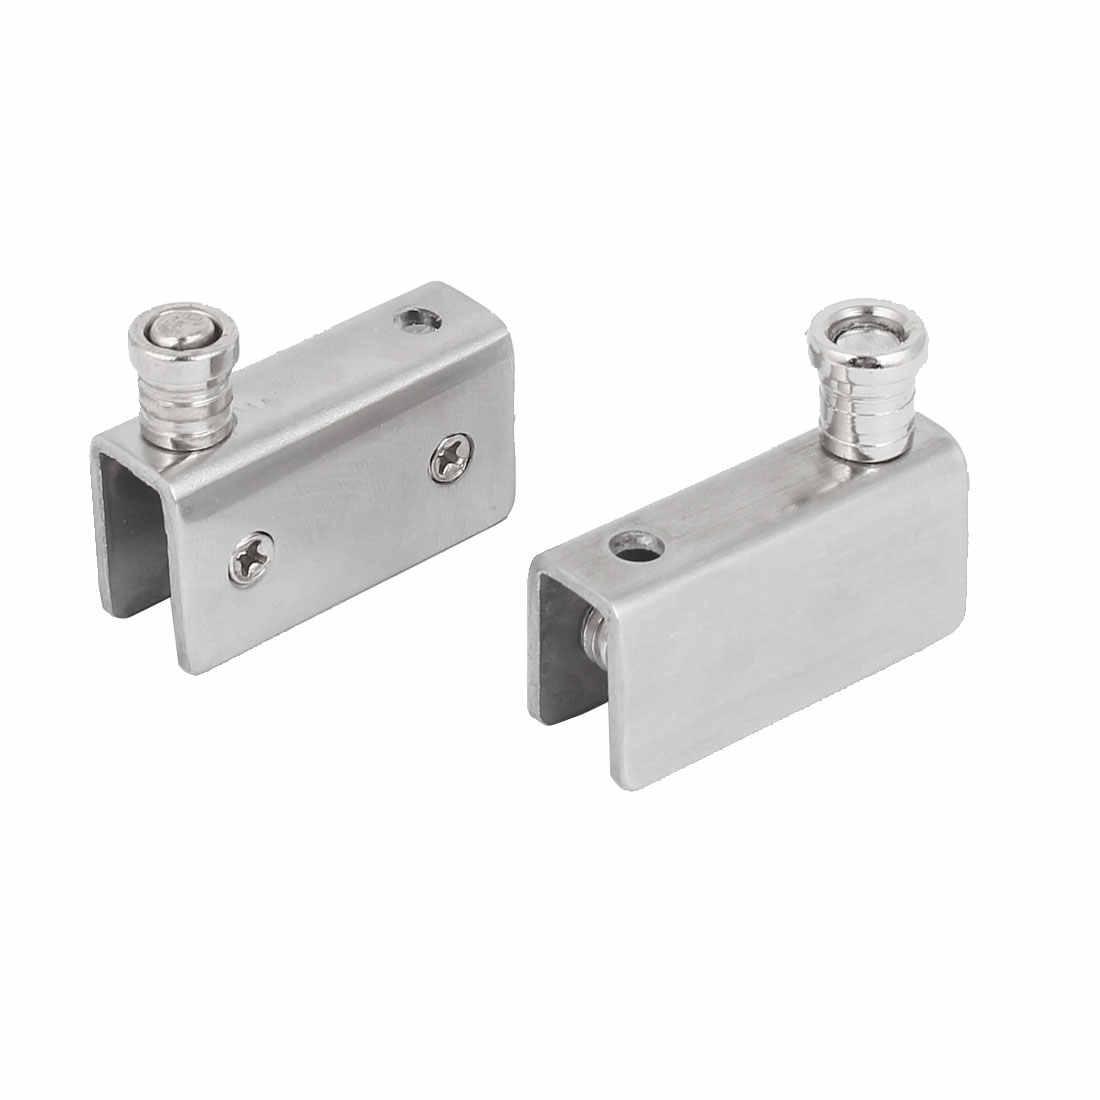 Shower Adjustable Stainless Steel D Shaped Glass Clamp Clip Door Hinge 8mm-13mm